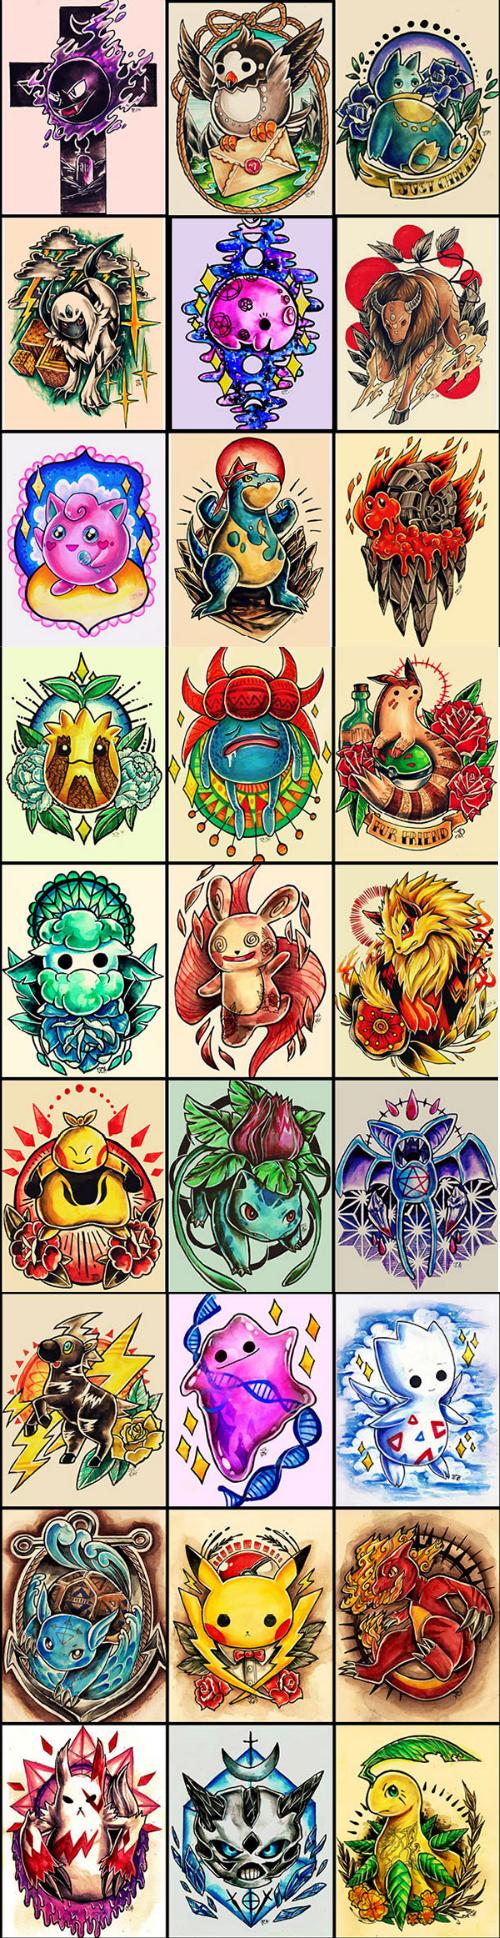 Considering a Pokémon Tattoo?